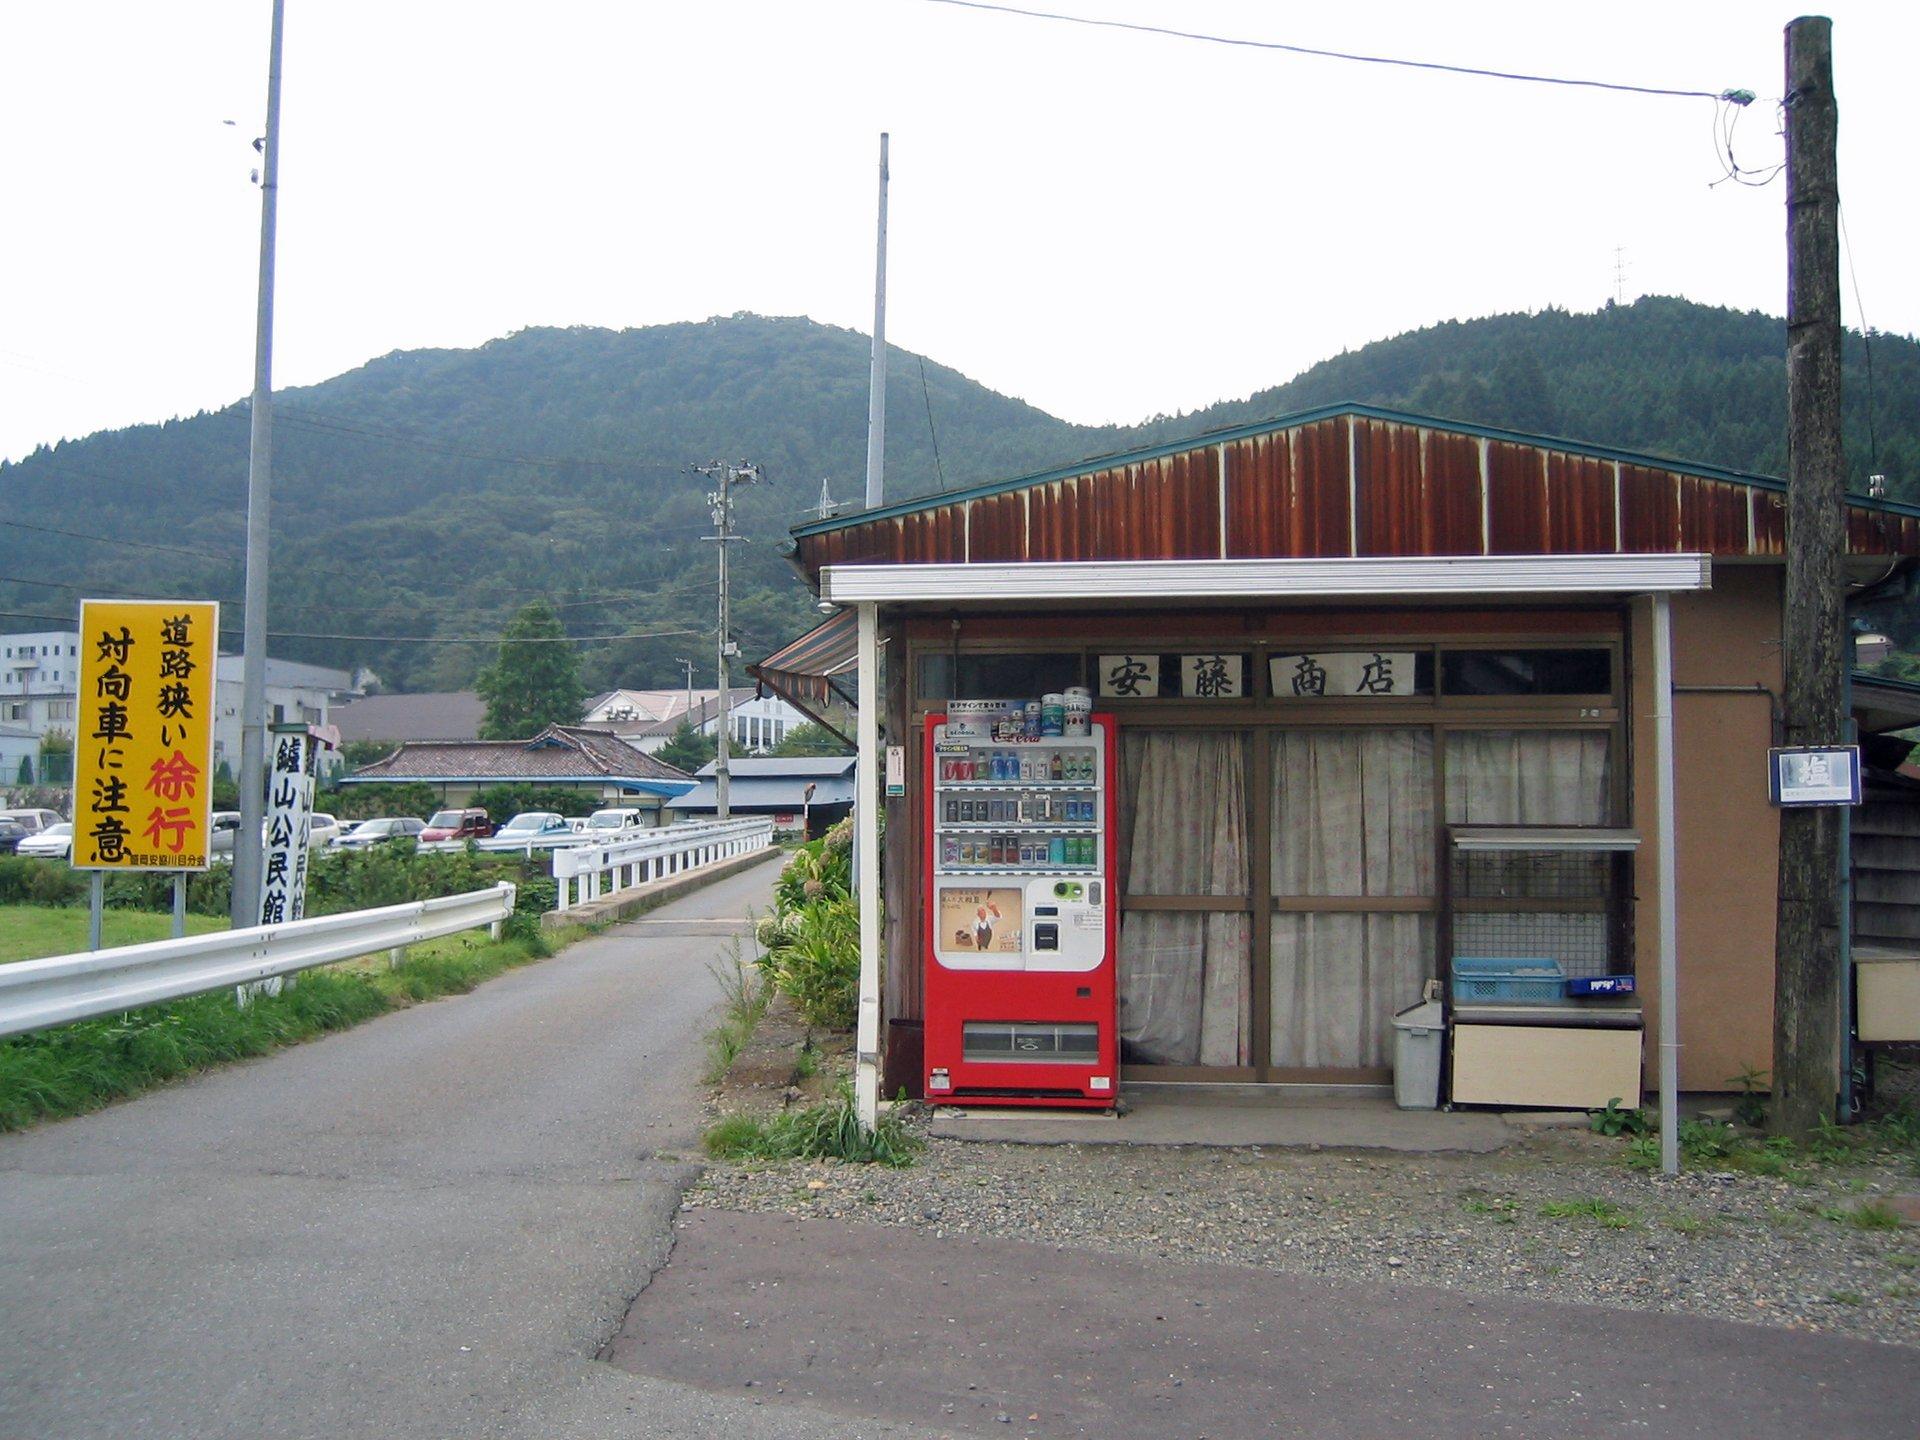 安藤商店と自販機